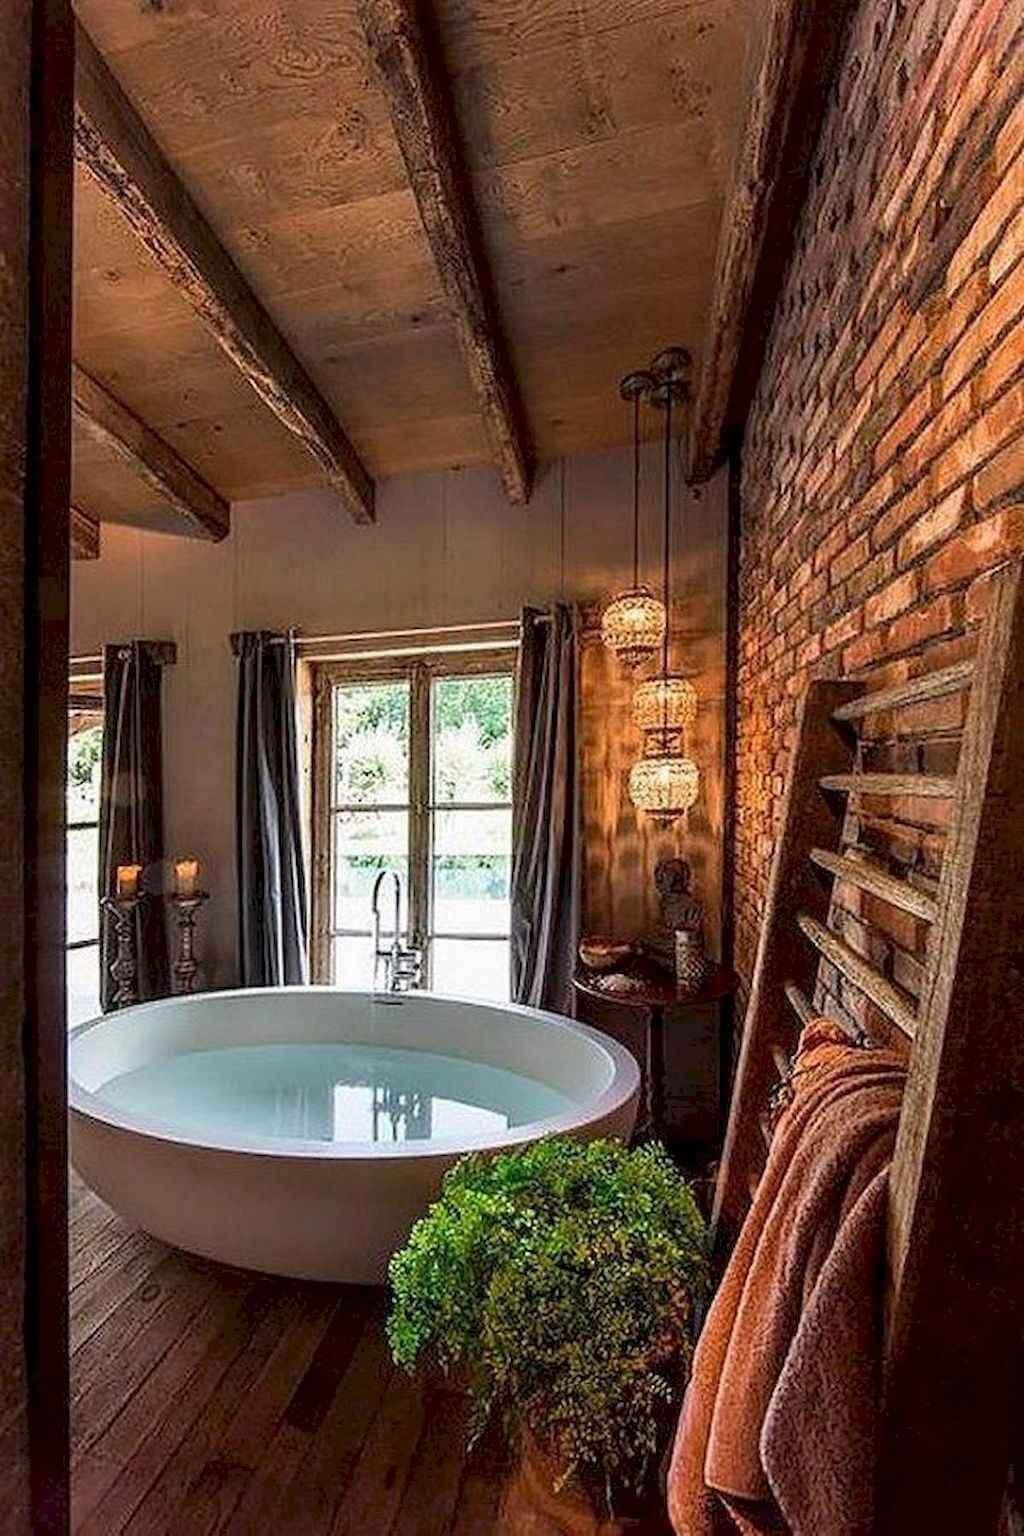 25 Cozy Rustic Bathroom Decor To Guide Your Renovation - W16